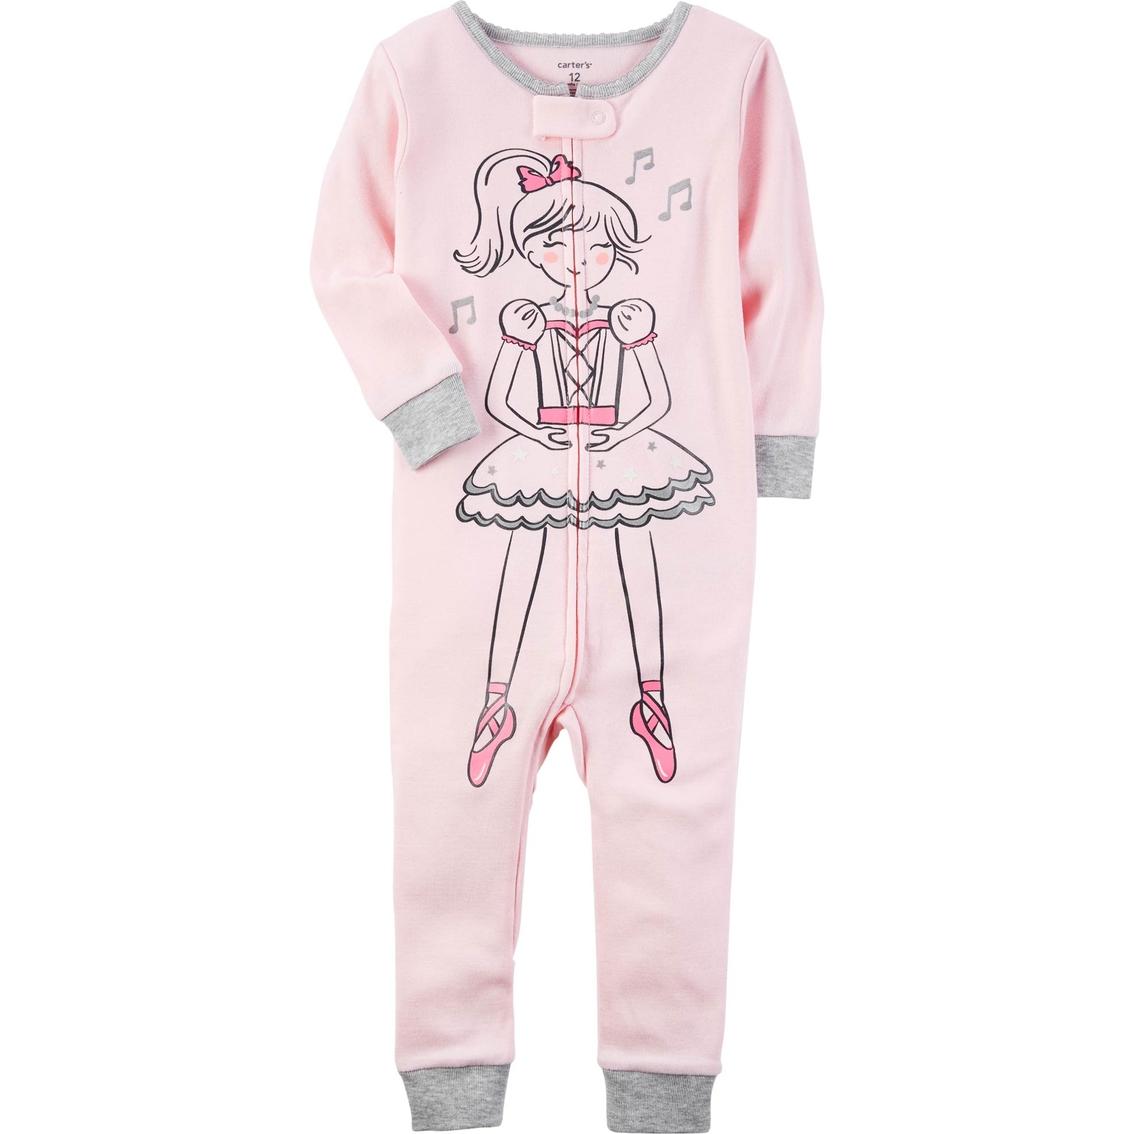 244703e46 Carter s Infant Girls Ballerina 1 Pc. Footless Pajama